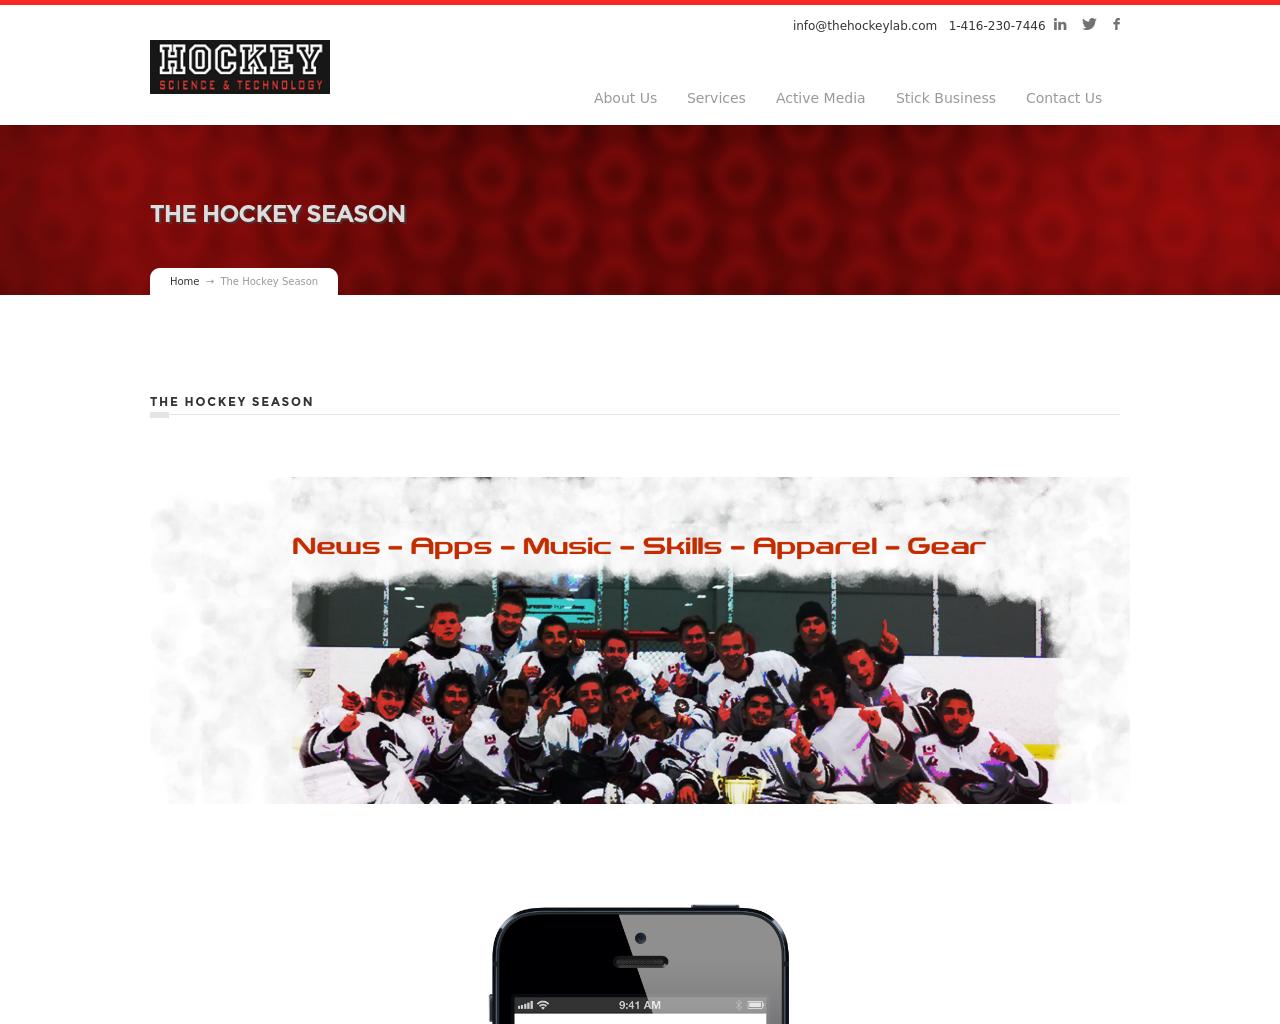 The-Hockey-Season-Advertising-Reviews-Pricing